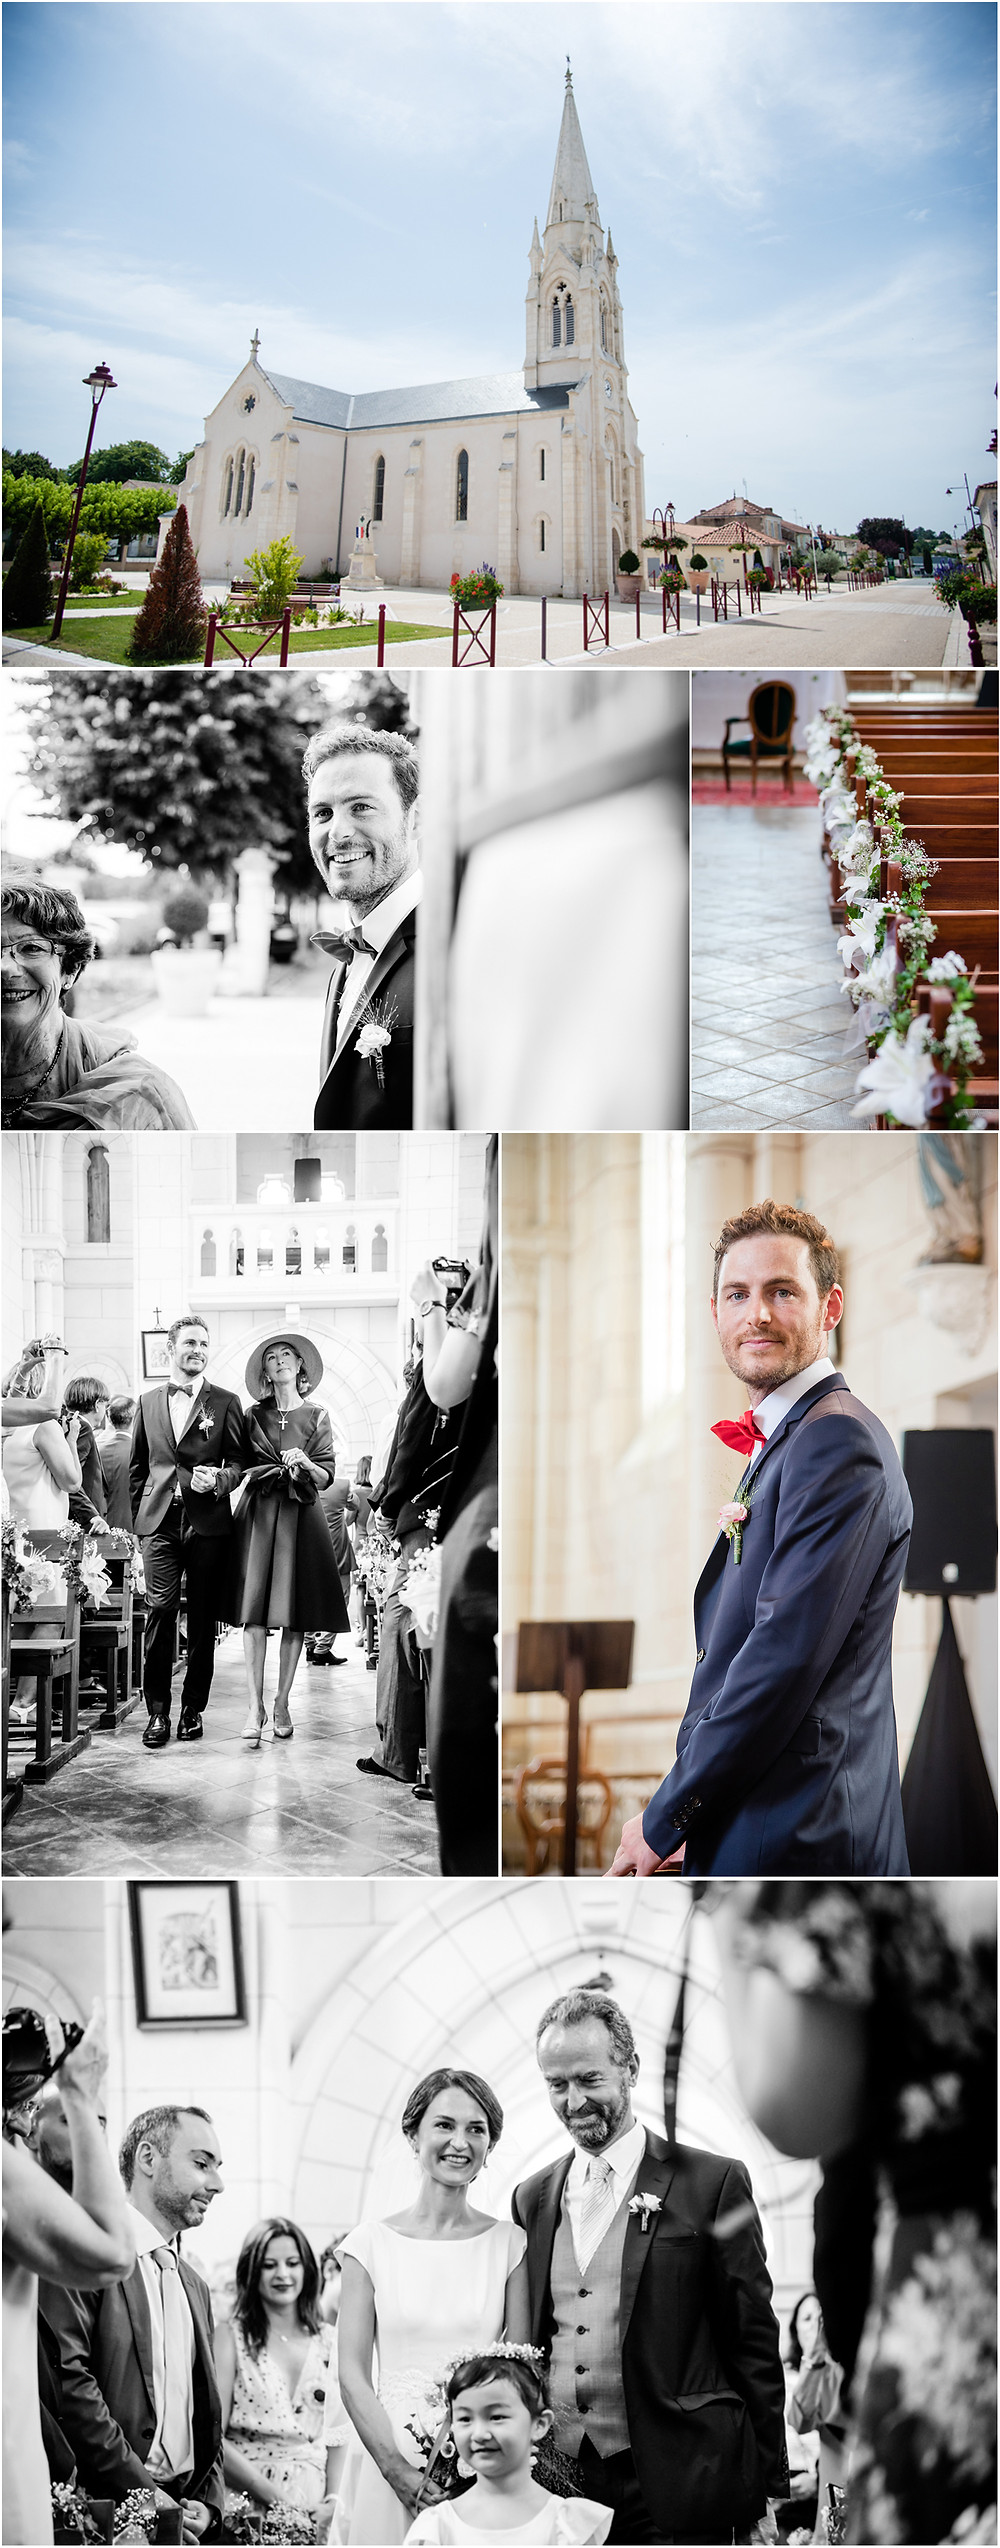 Mariage en charente - photos cérémonie religieuse - Brigitte Delibes Photographie - Photographe Mariage Nantes